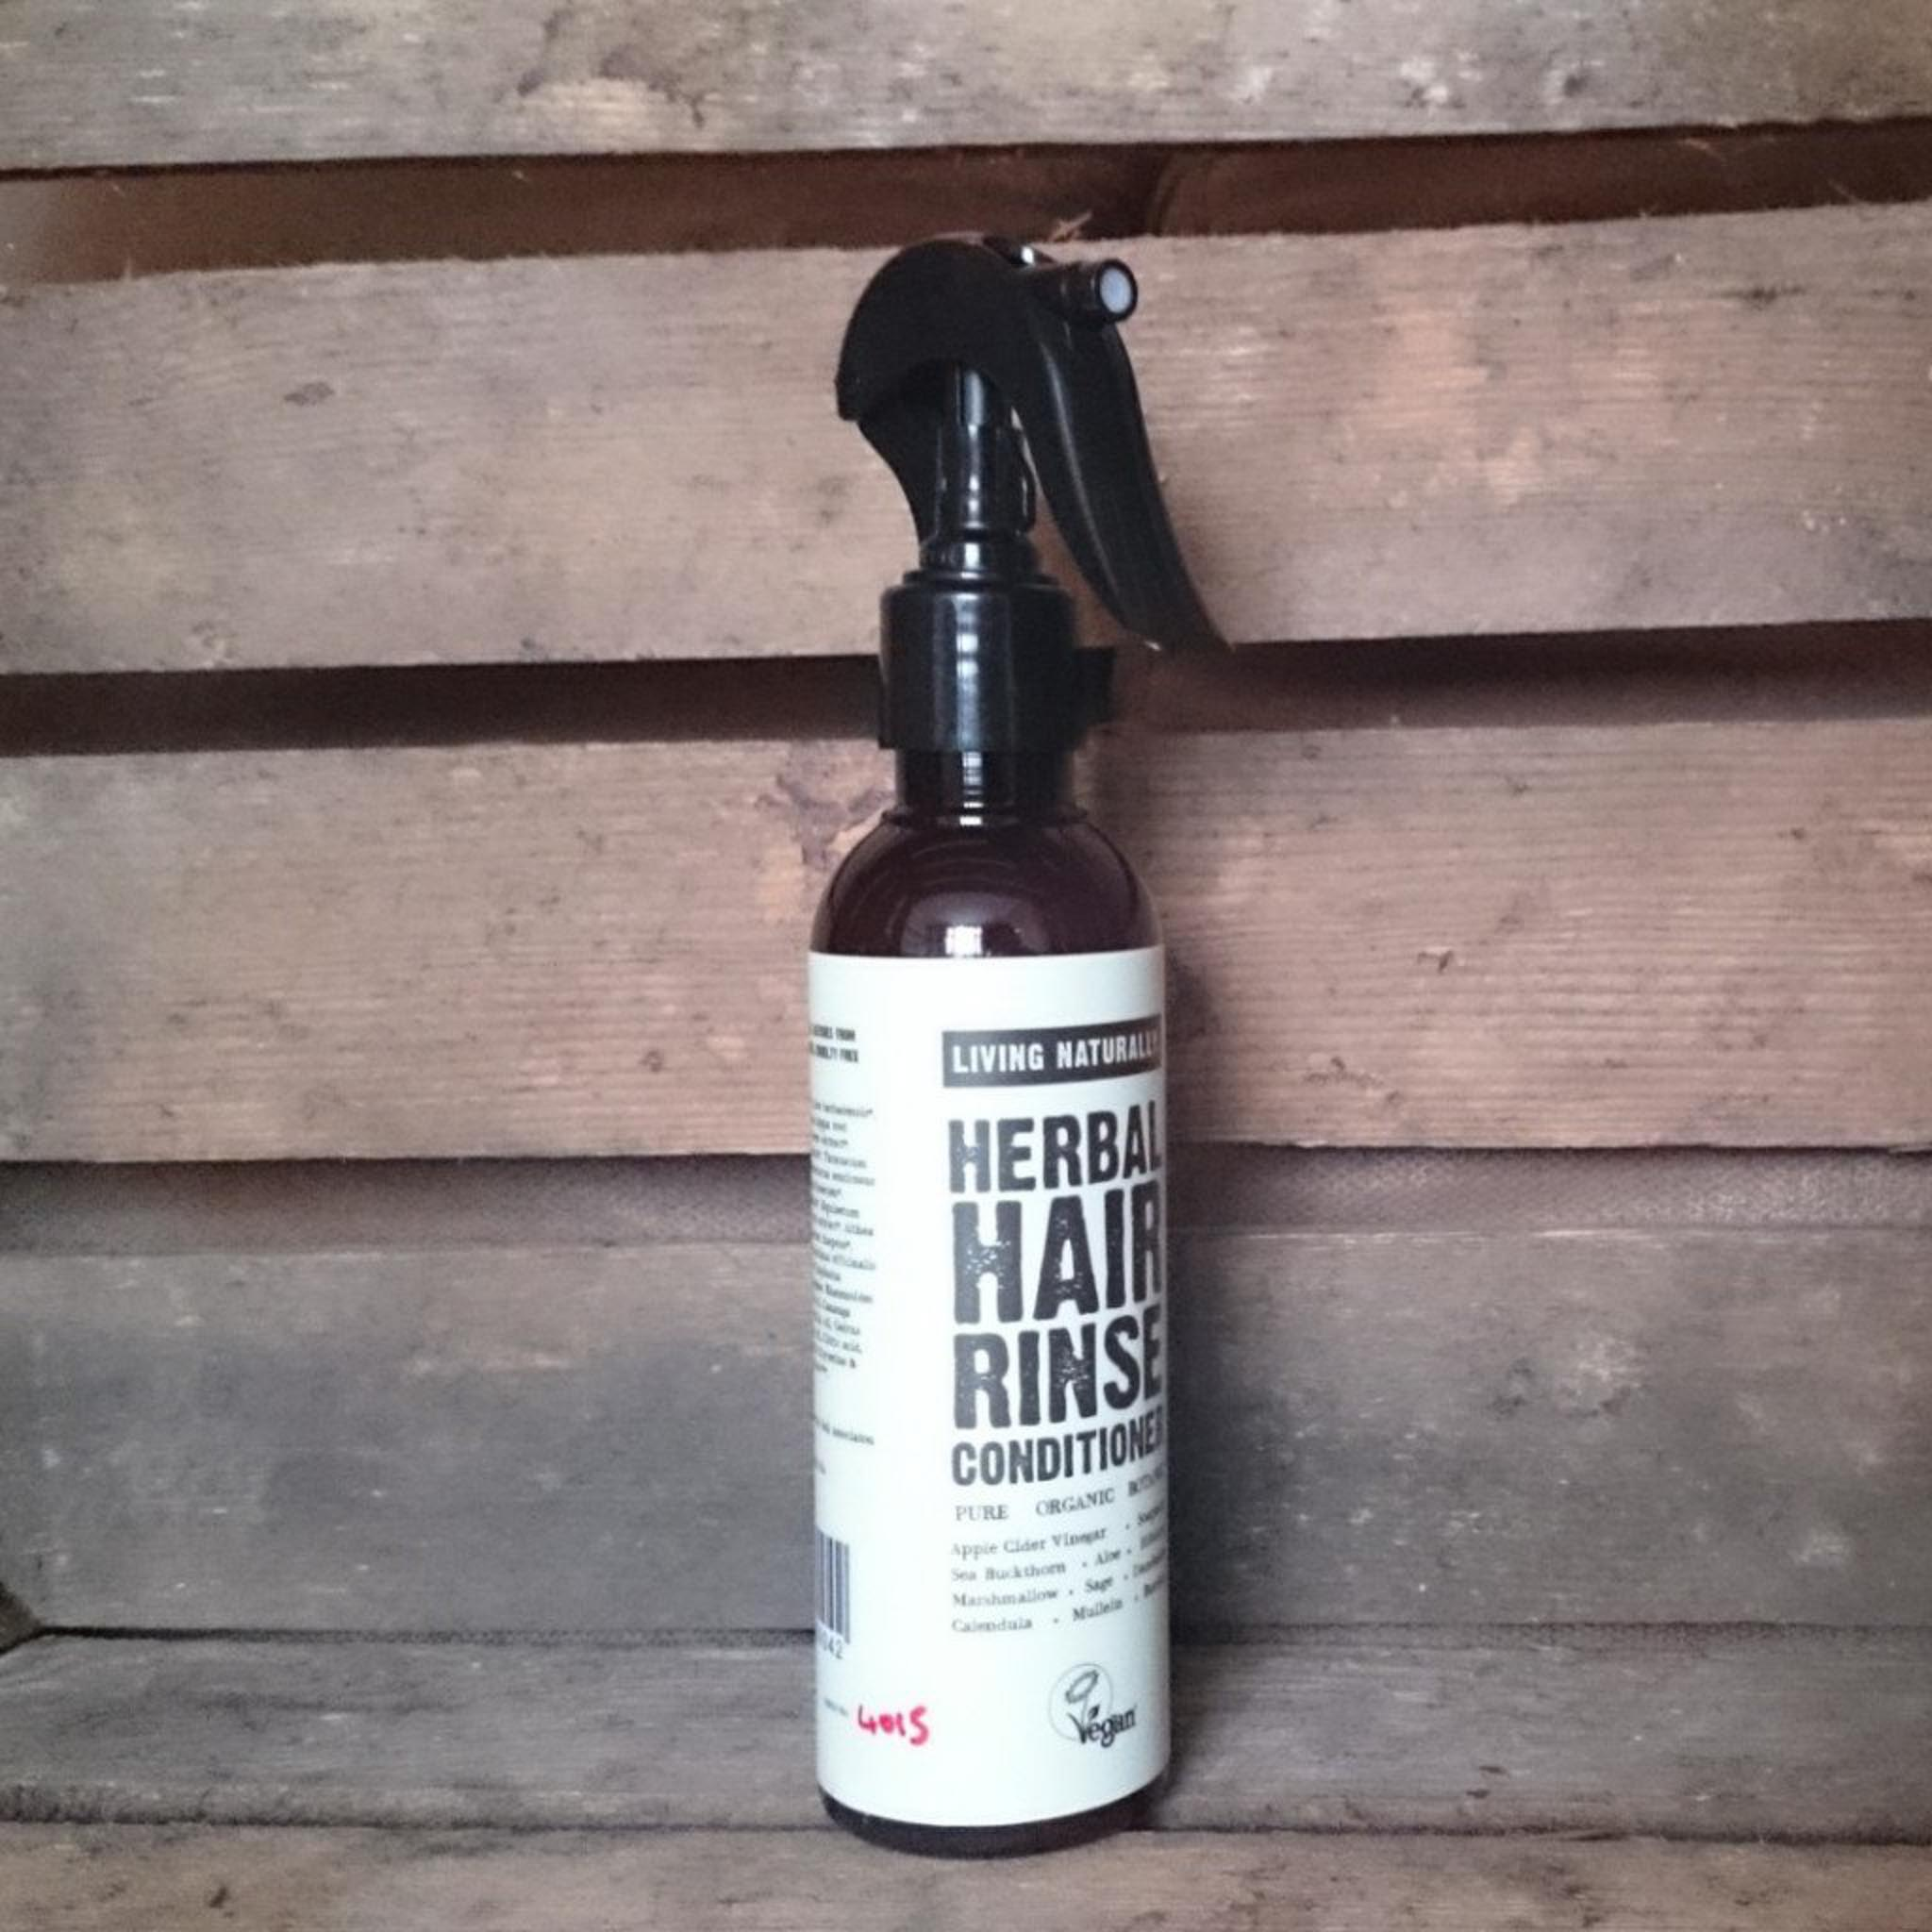 Soapnuts Organic Herbal Hair Rinse Conditioner